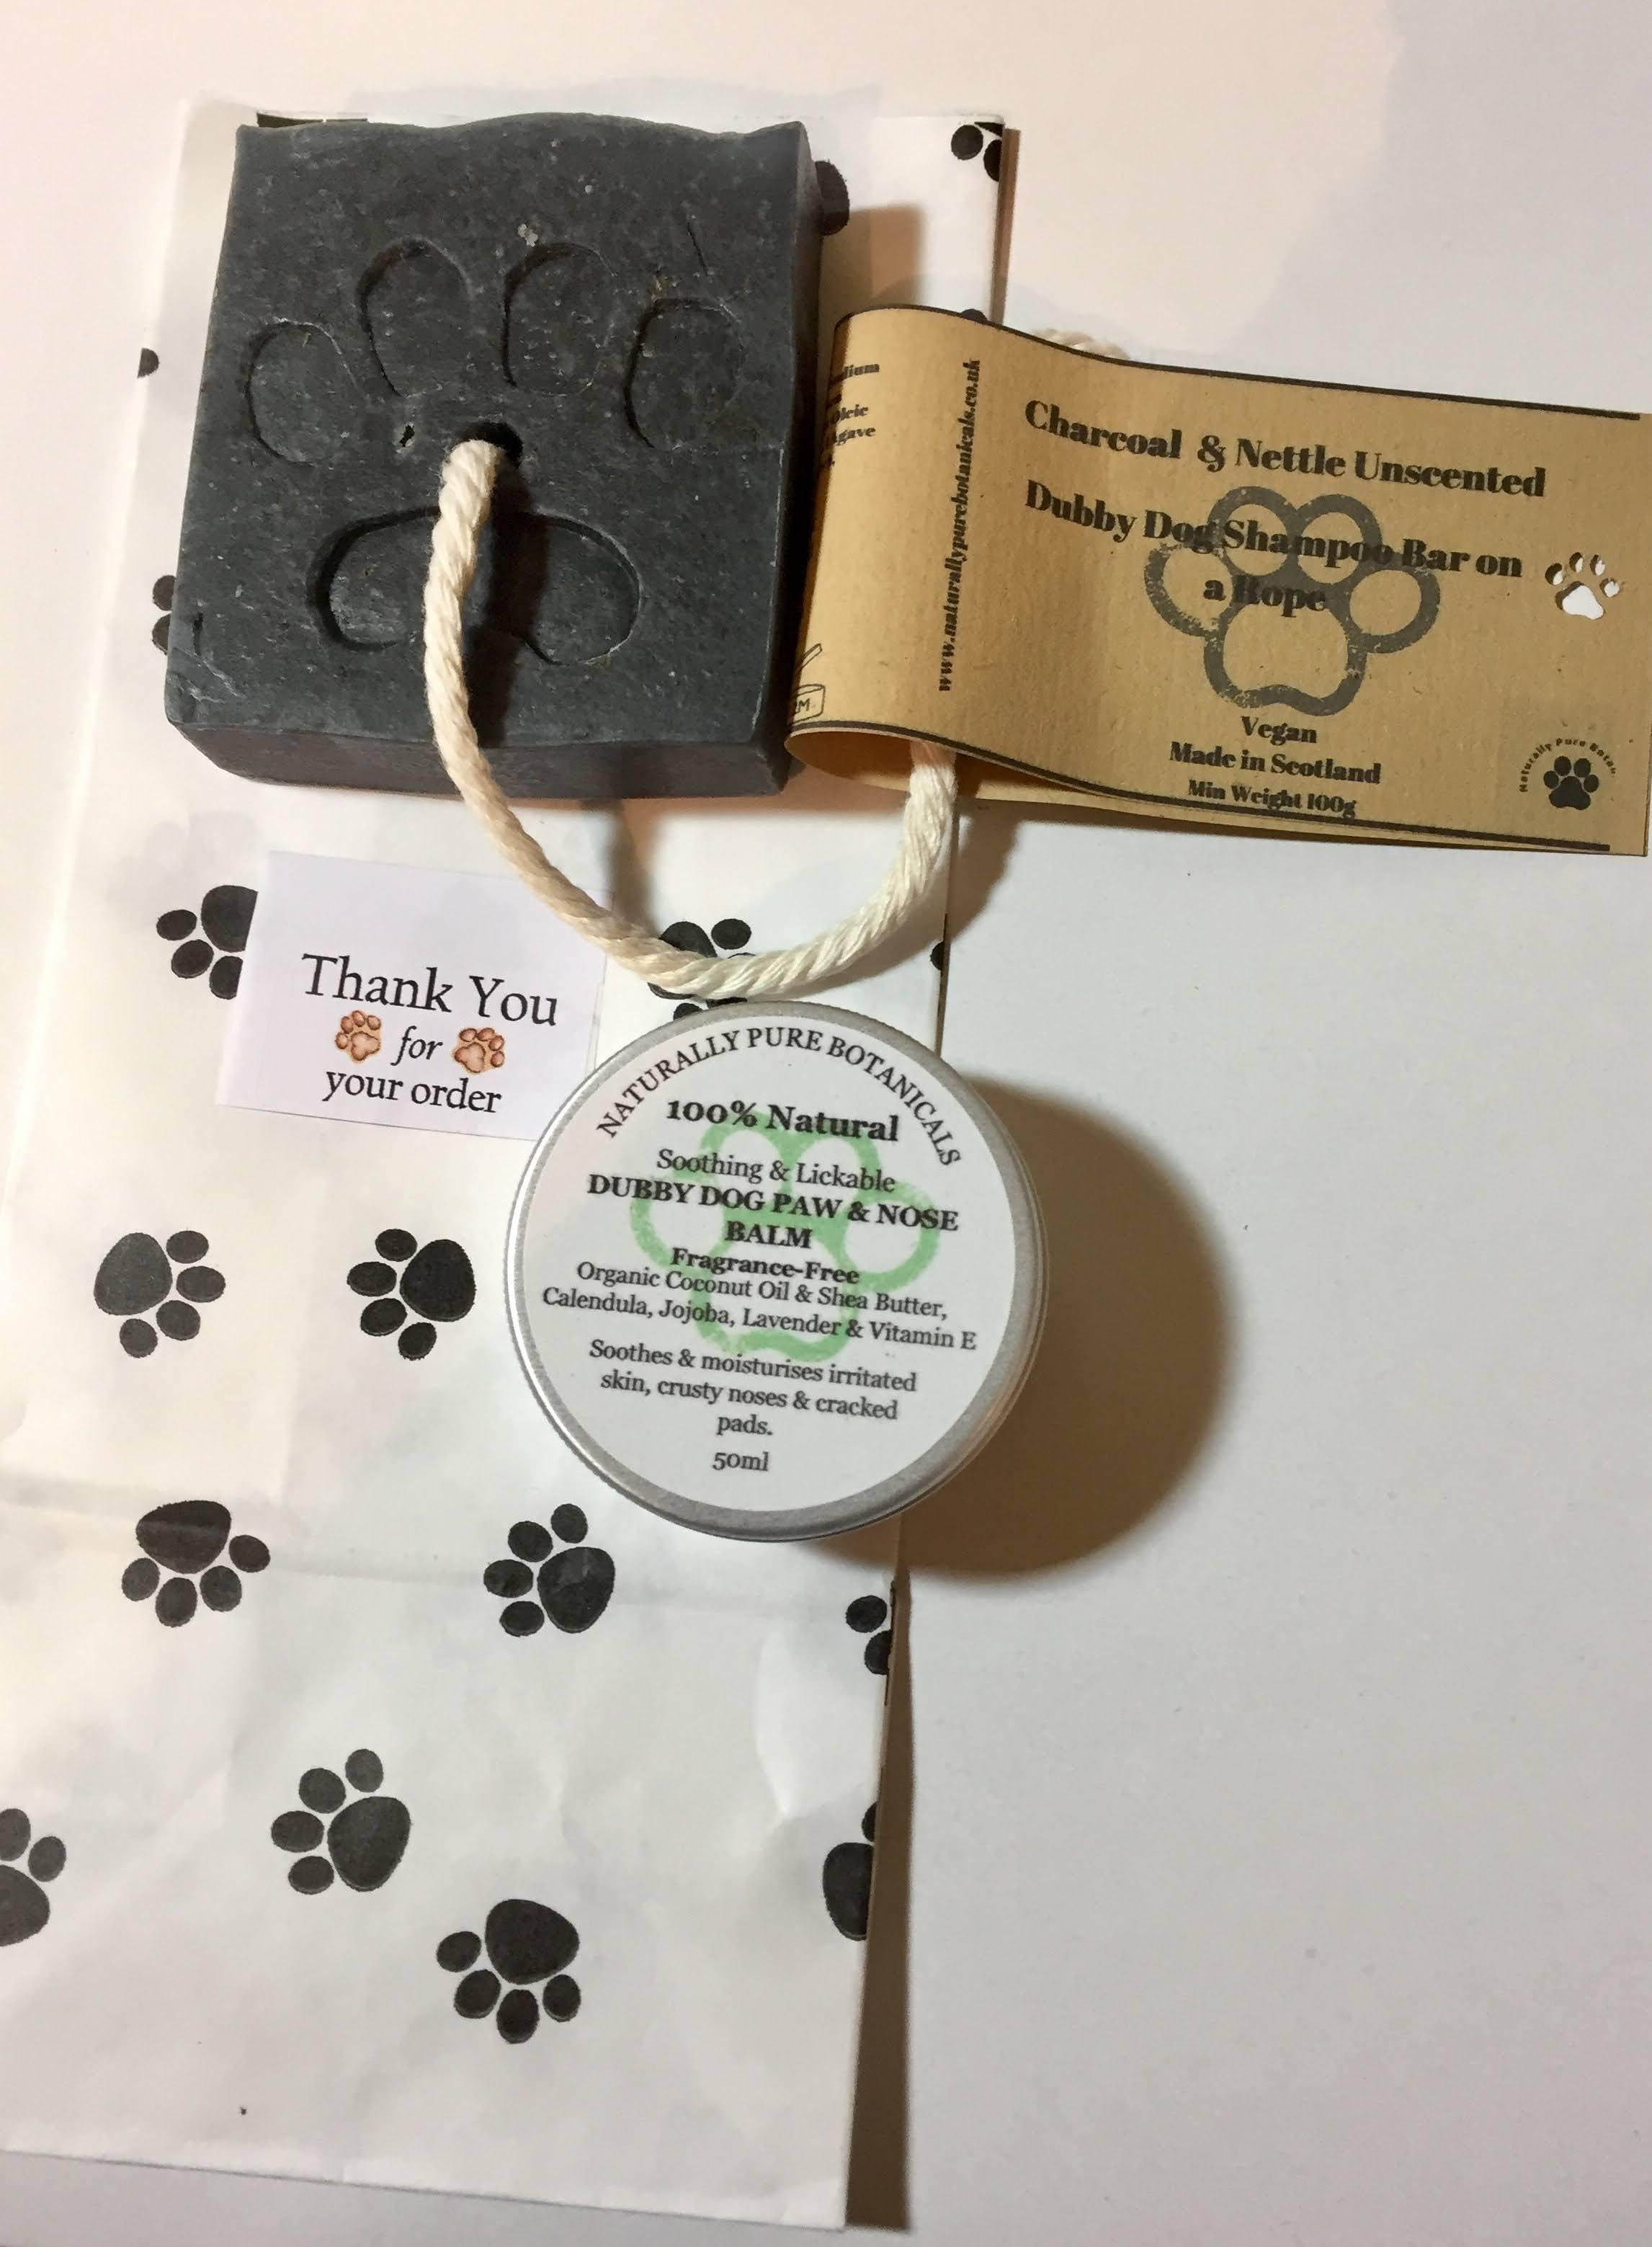 Dubby Dog Shampoo bar/ Paw & Nose Balm Gift Set- 50ml.